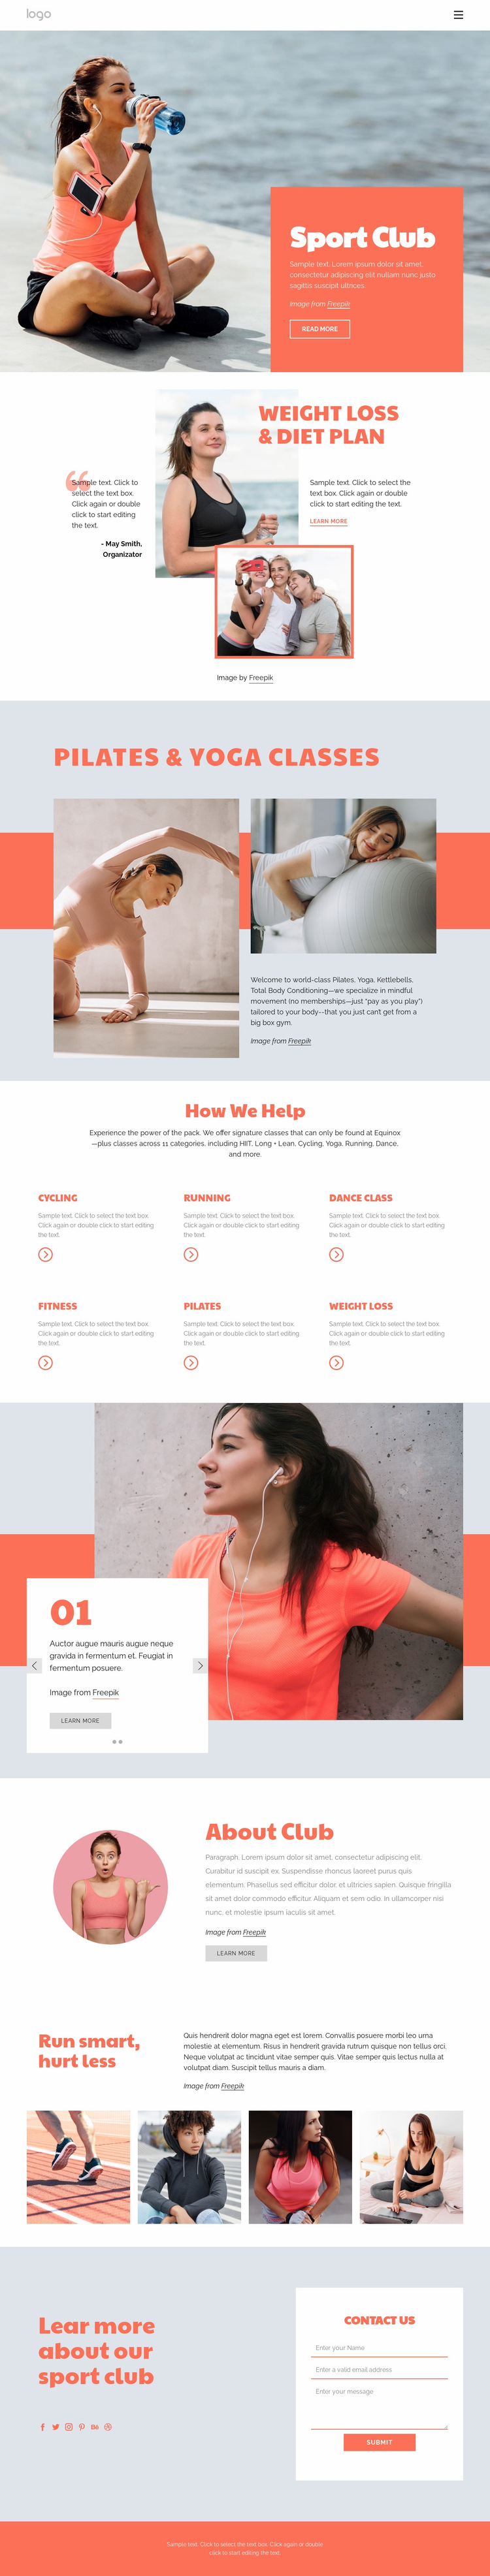 Pilates vs yoga Web Page Design